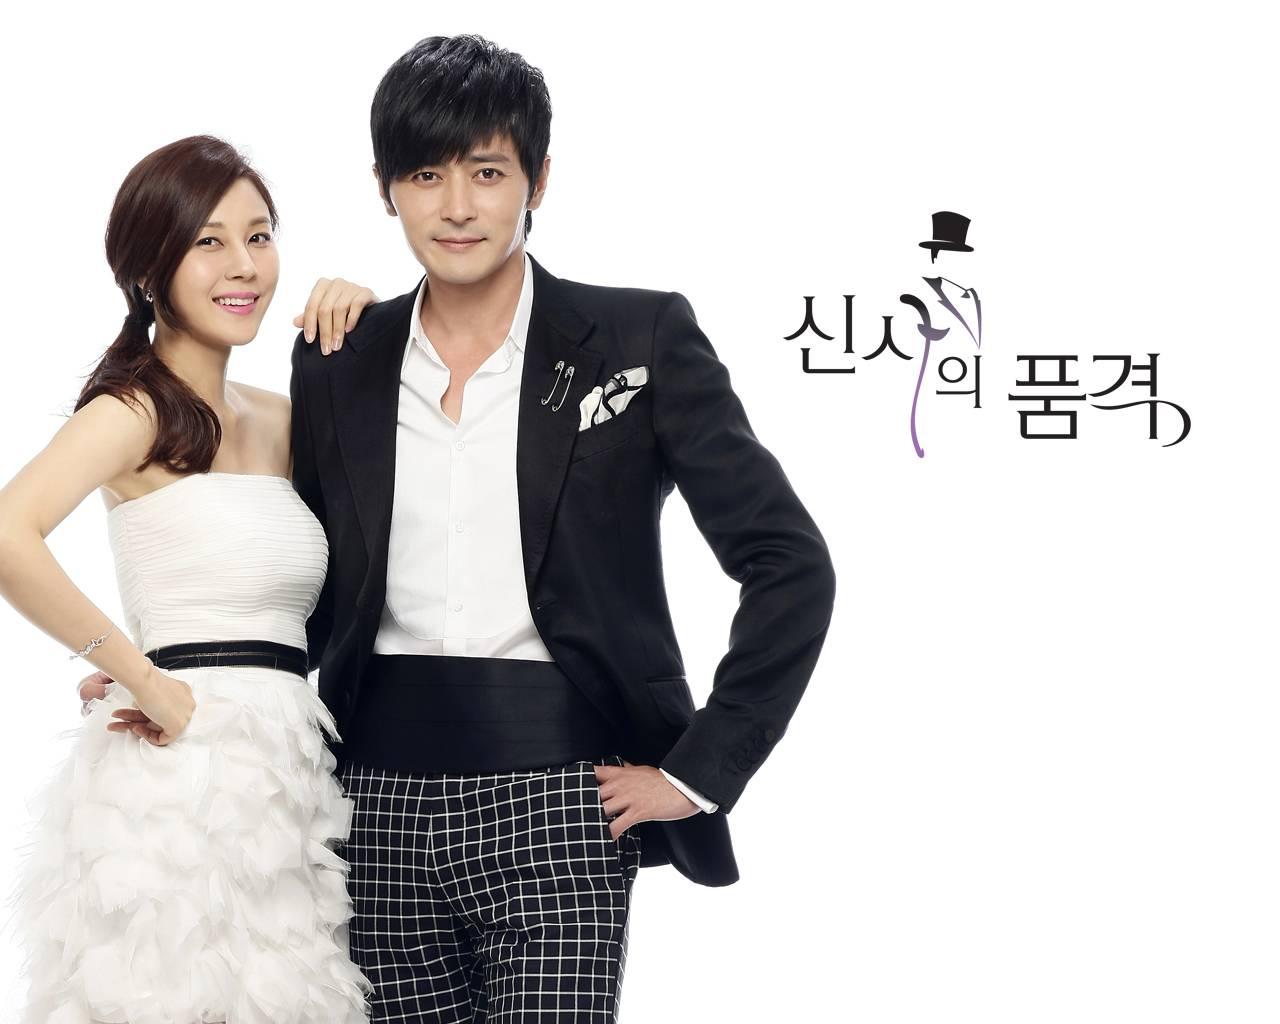 A Gentleman's Dignity (Korean Drama - 2012) - 신사의 품격 @ HanCinema :: The Korean Movie and Drama Database